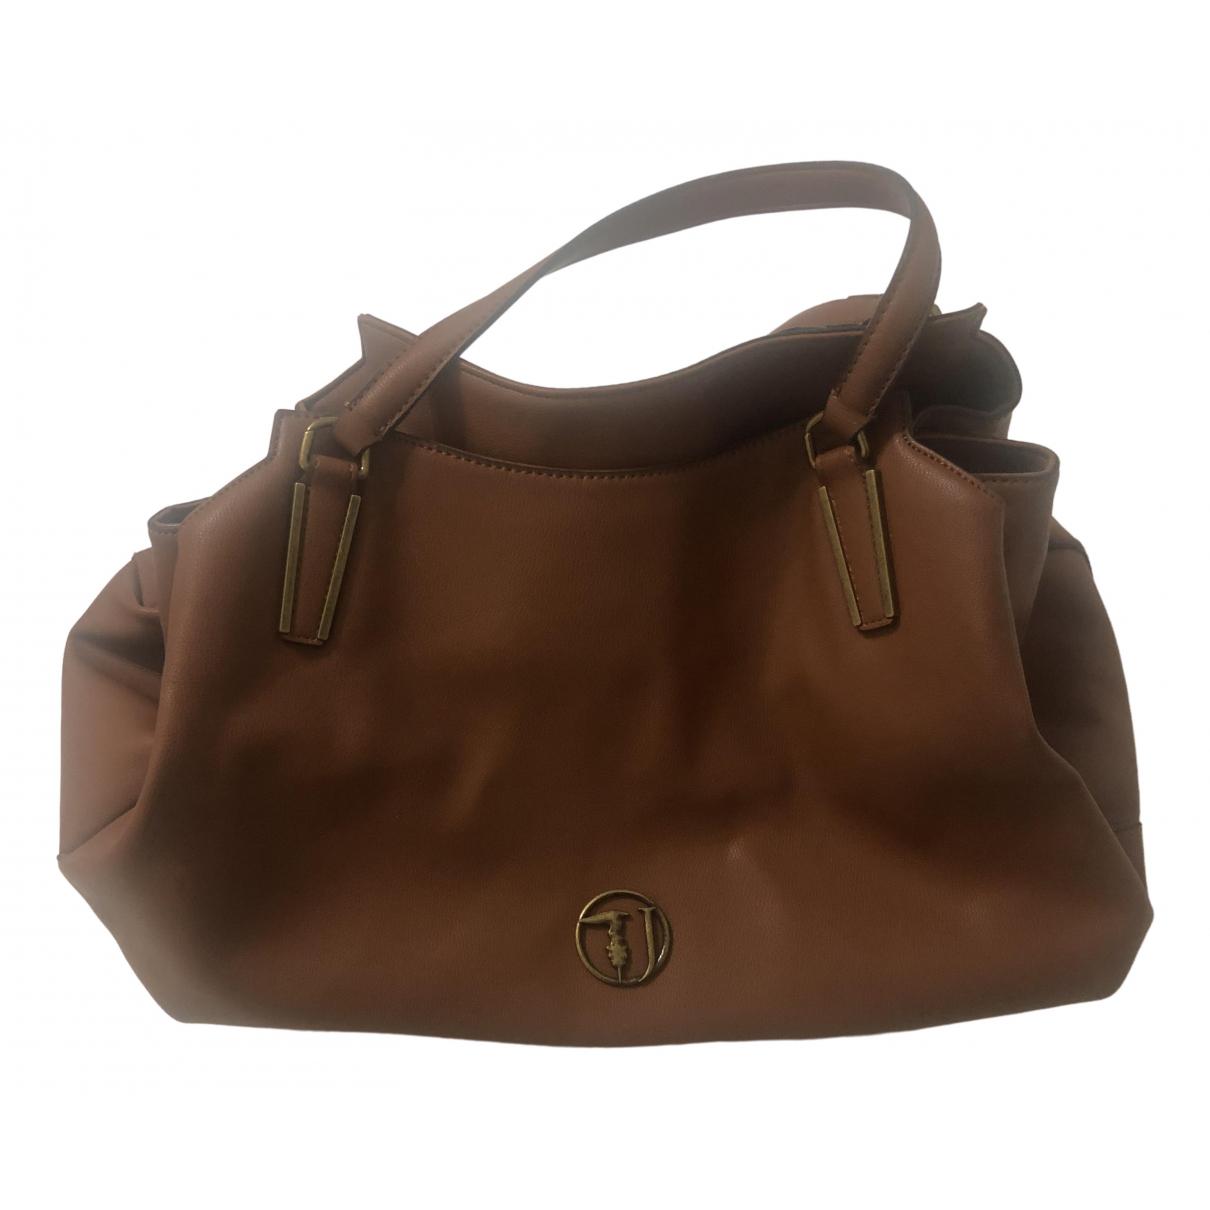 Trussardi Jeans \N Beige Leather handbag for Women \N